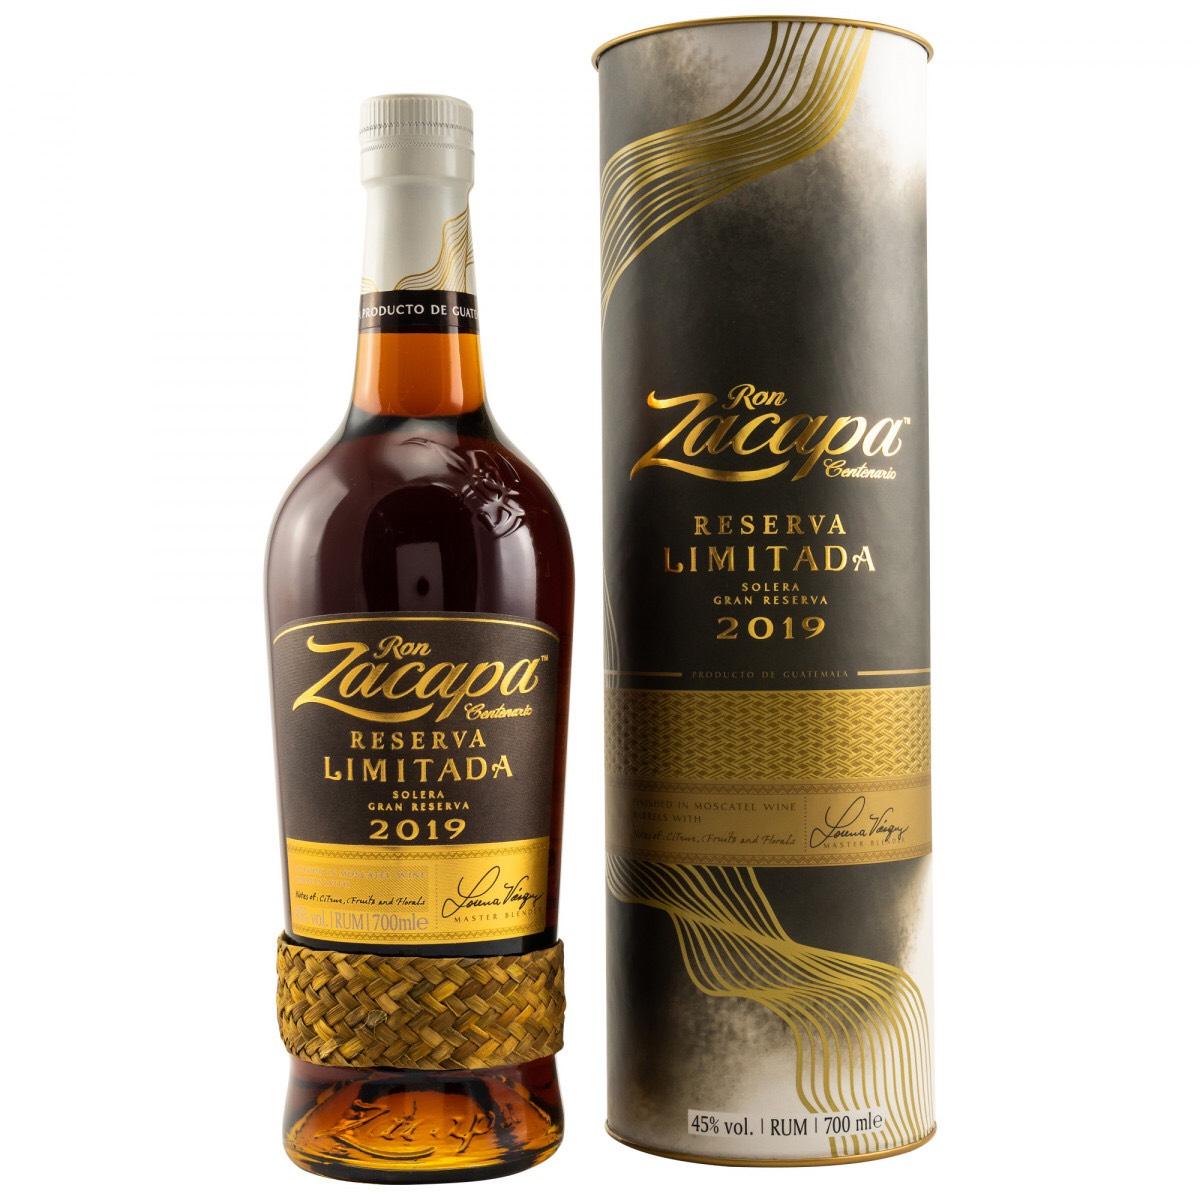 Bottle image of Ron Zacapa Reserva Limitada